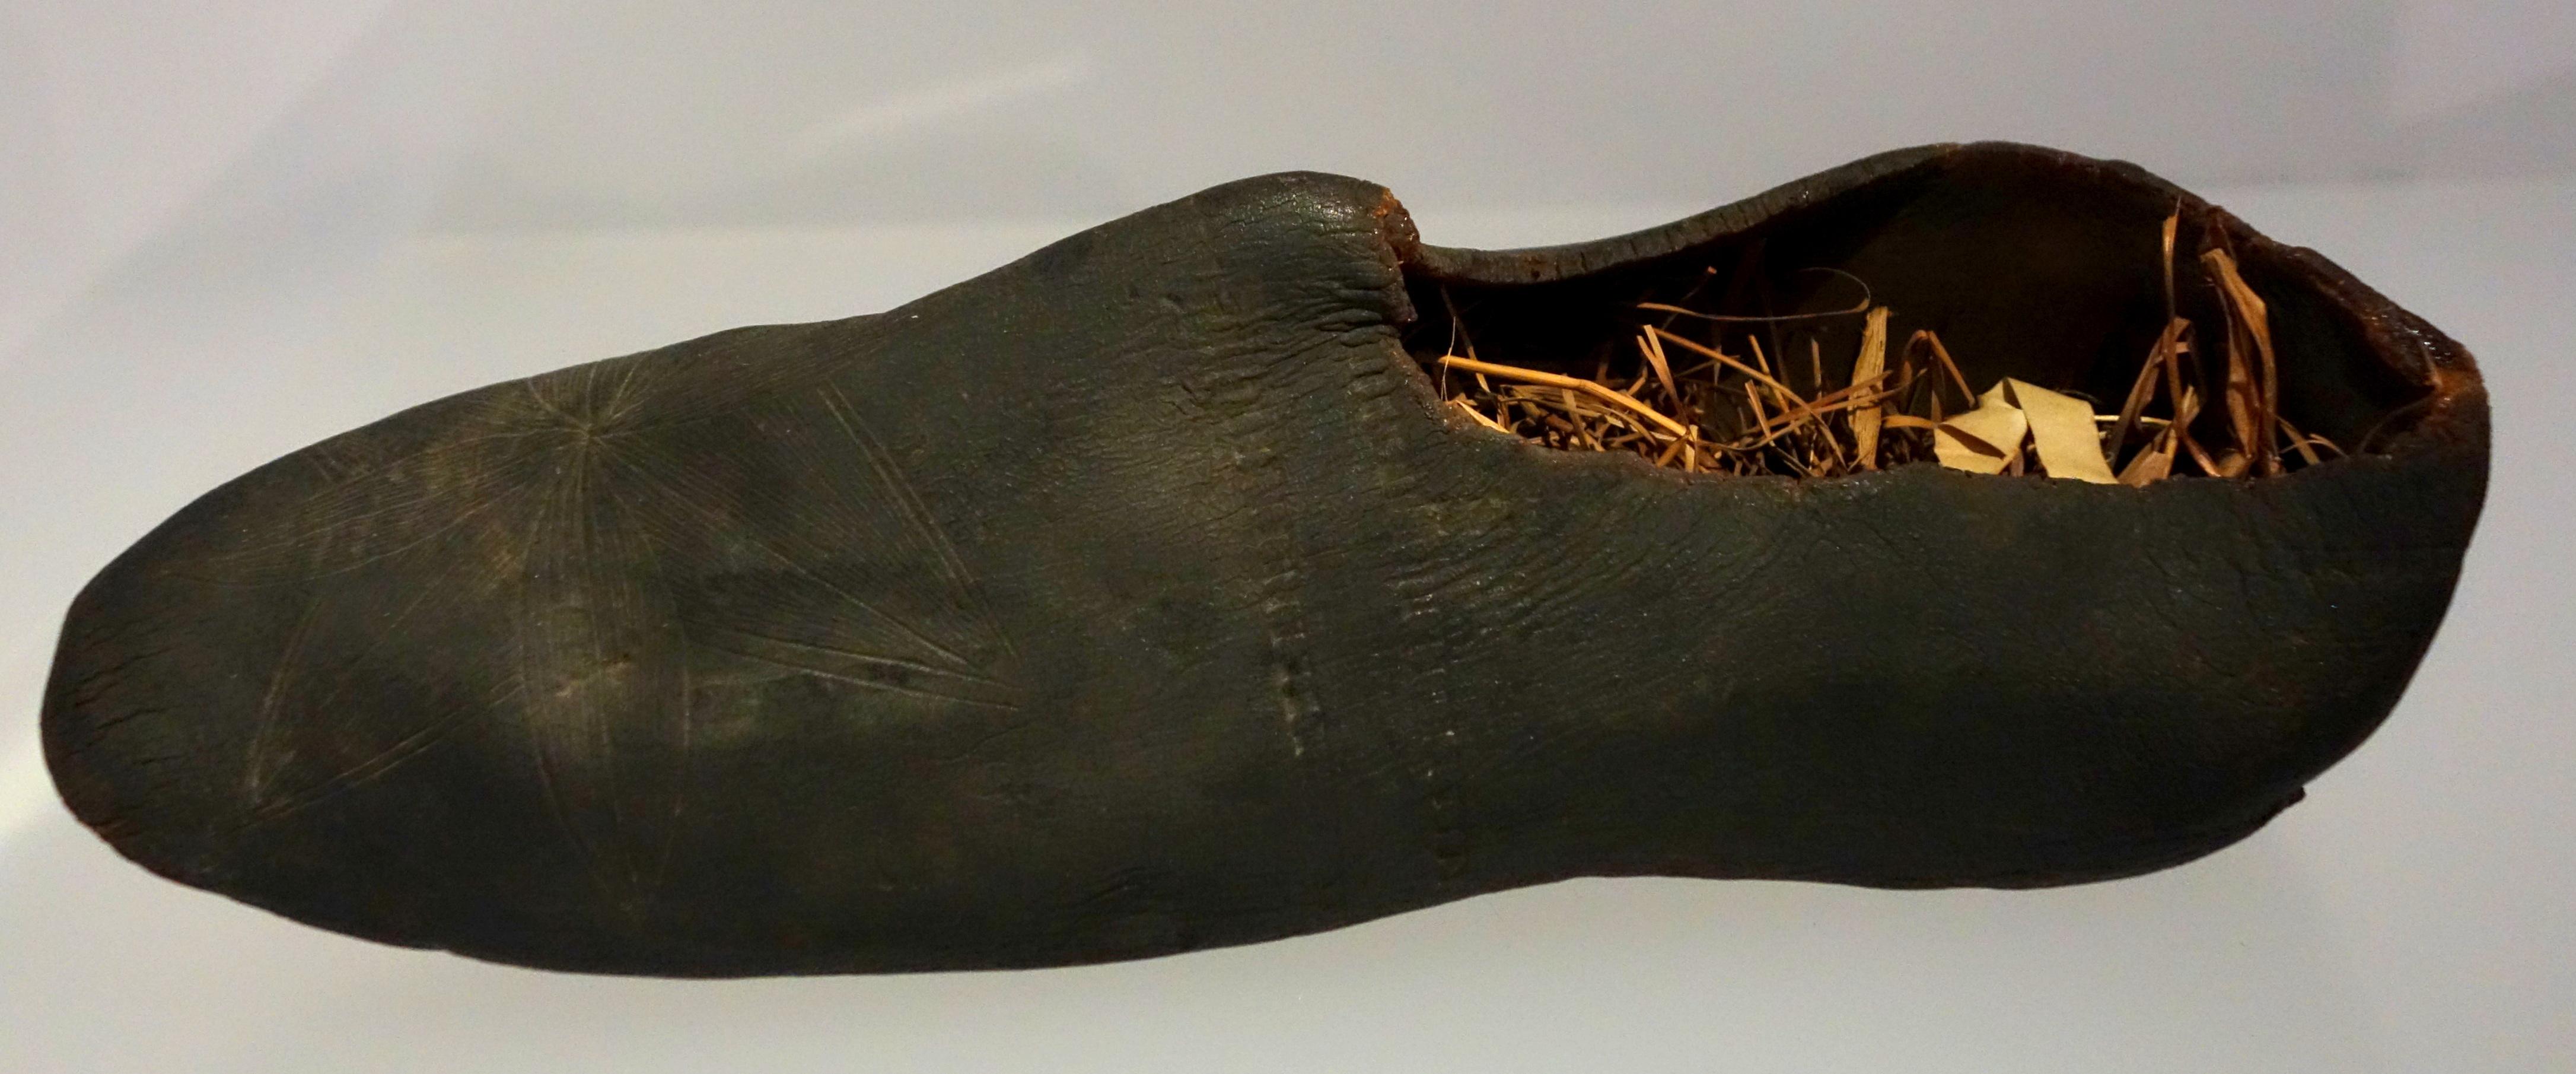 File Pre Vulcanized Rubber Overshoes 1830s Brazil Bata